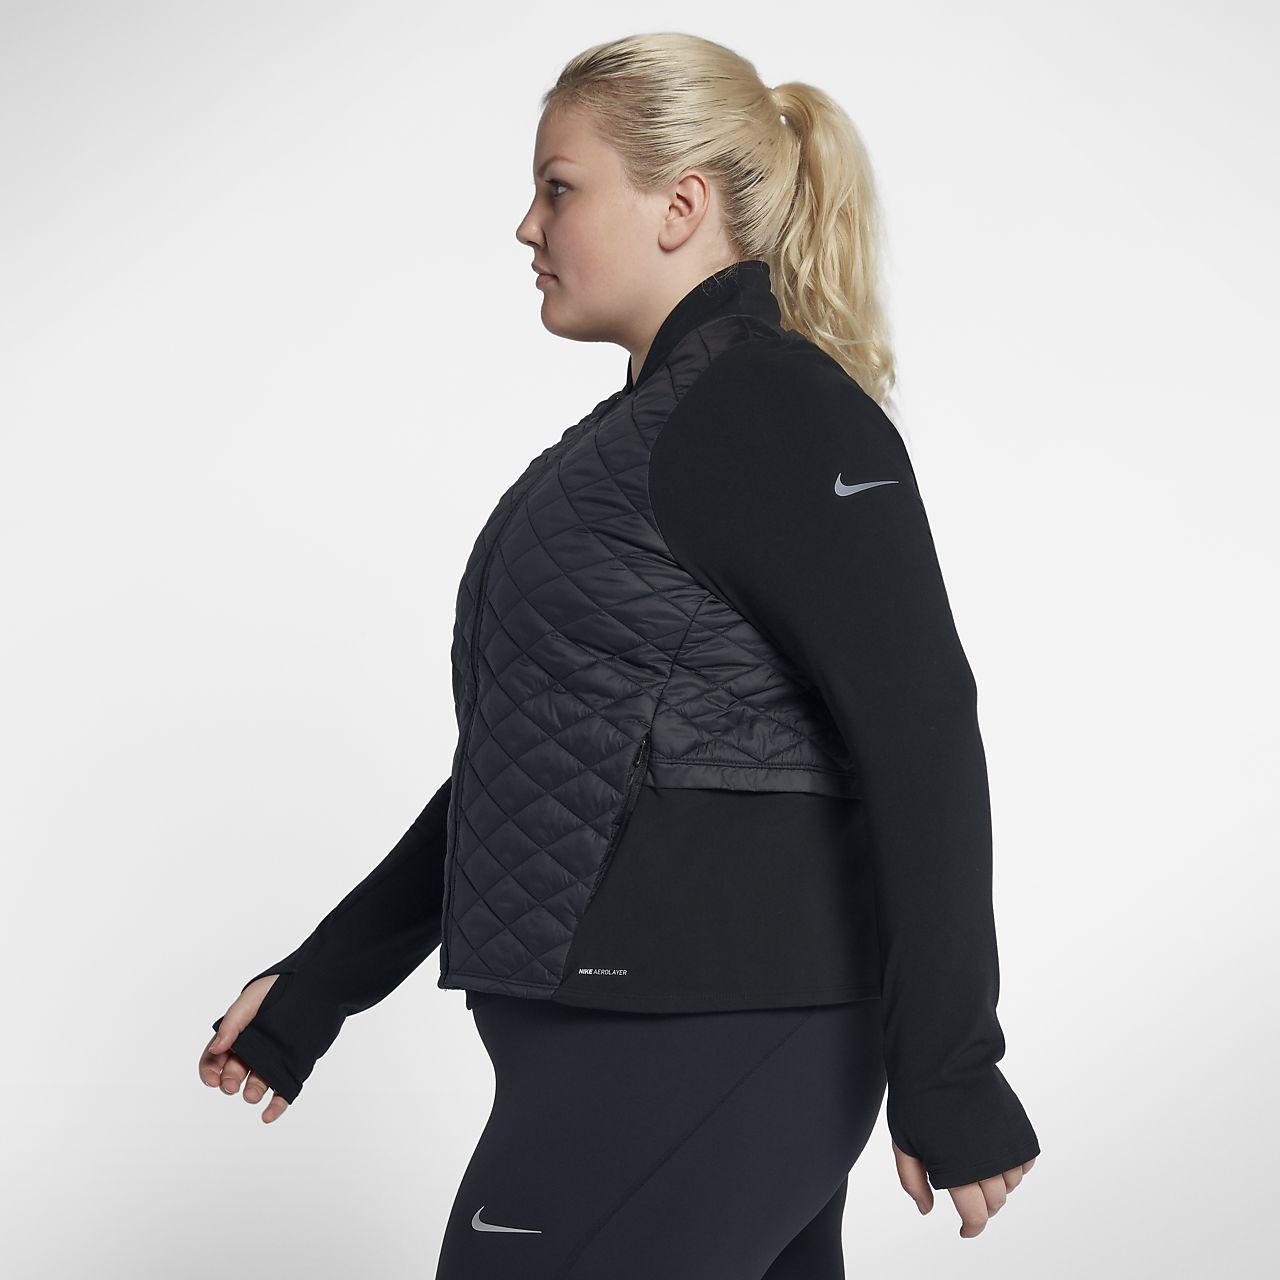 4dfb10b3610b Nike AeroLayer Women s Running Jacket (Plus Size). Nike.com AU